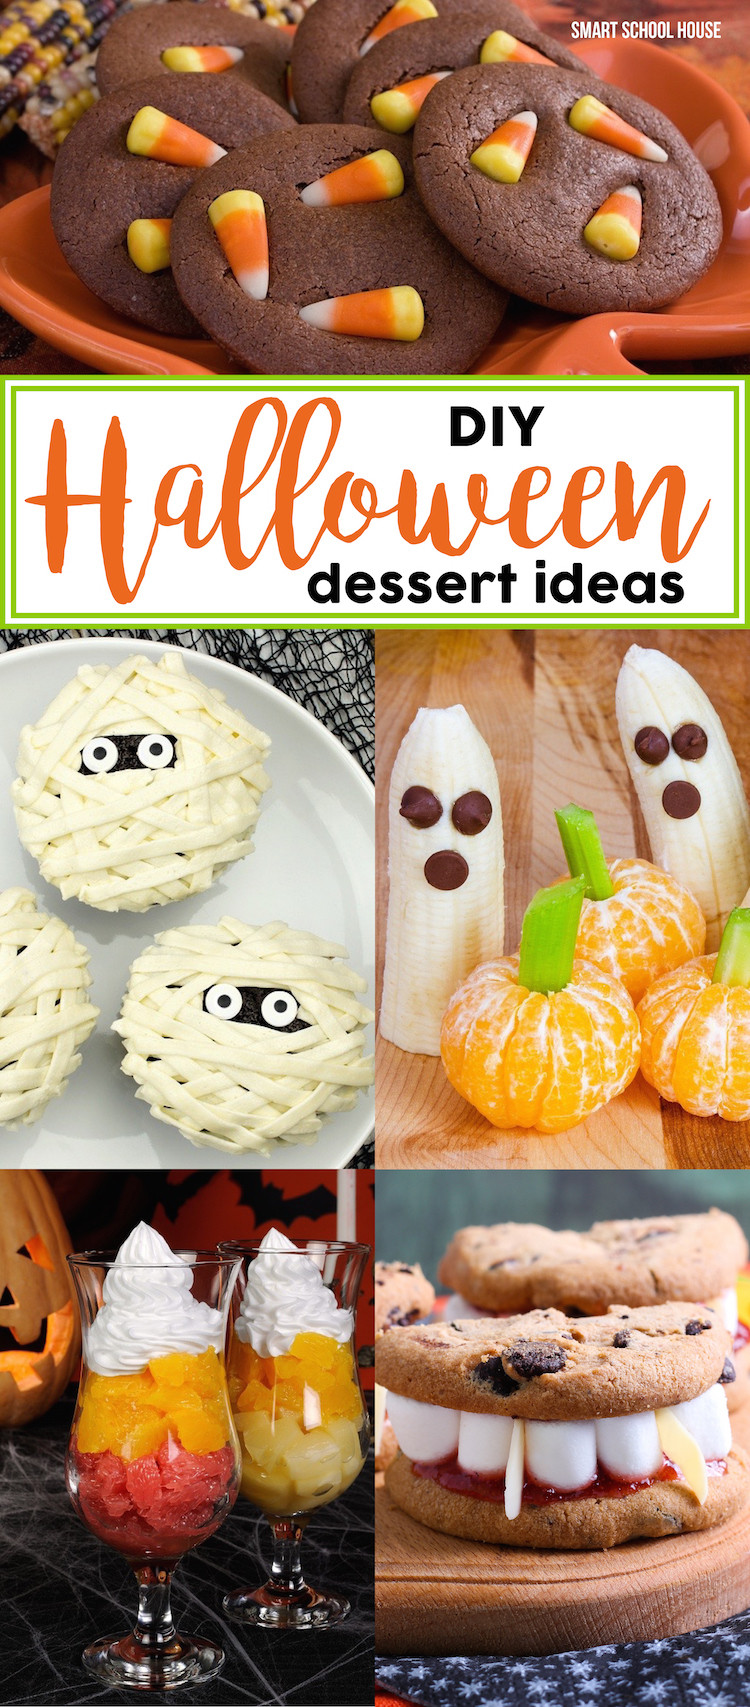 Halloween Themed Desserts  Halloween Dessert Ideas Page 5 of 22 Smart School House